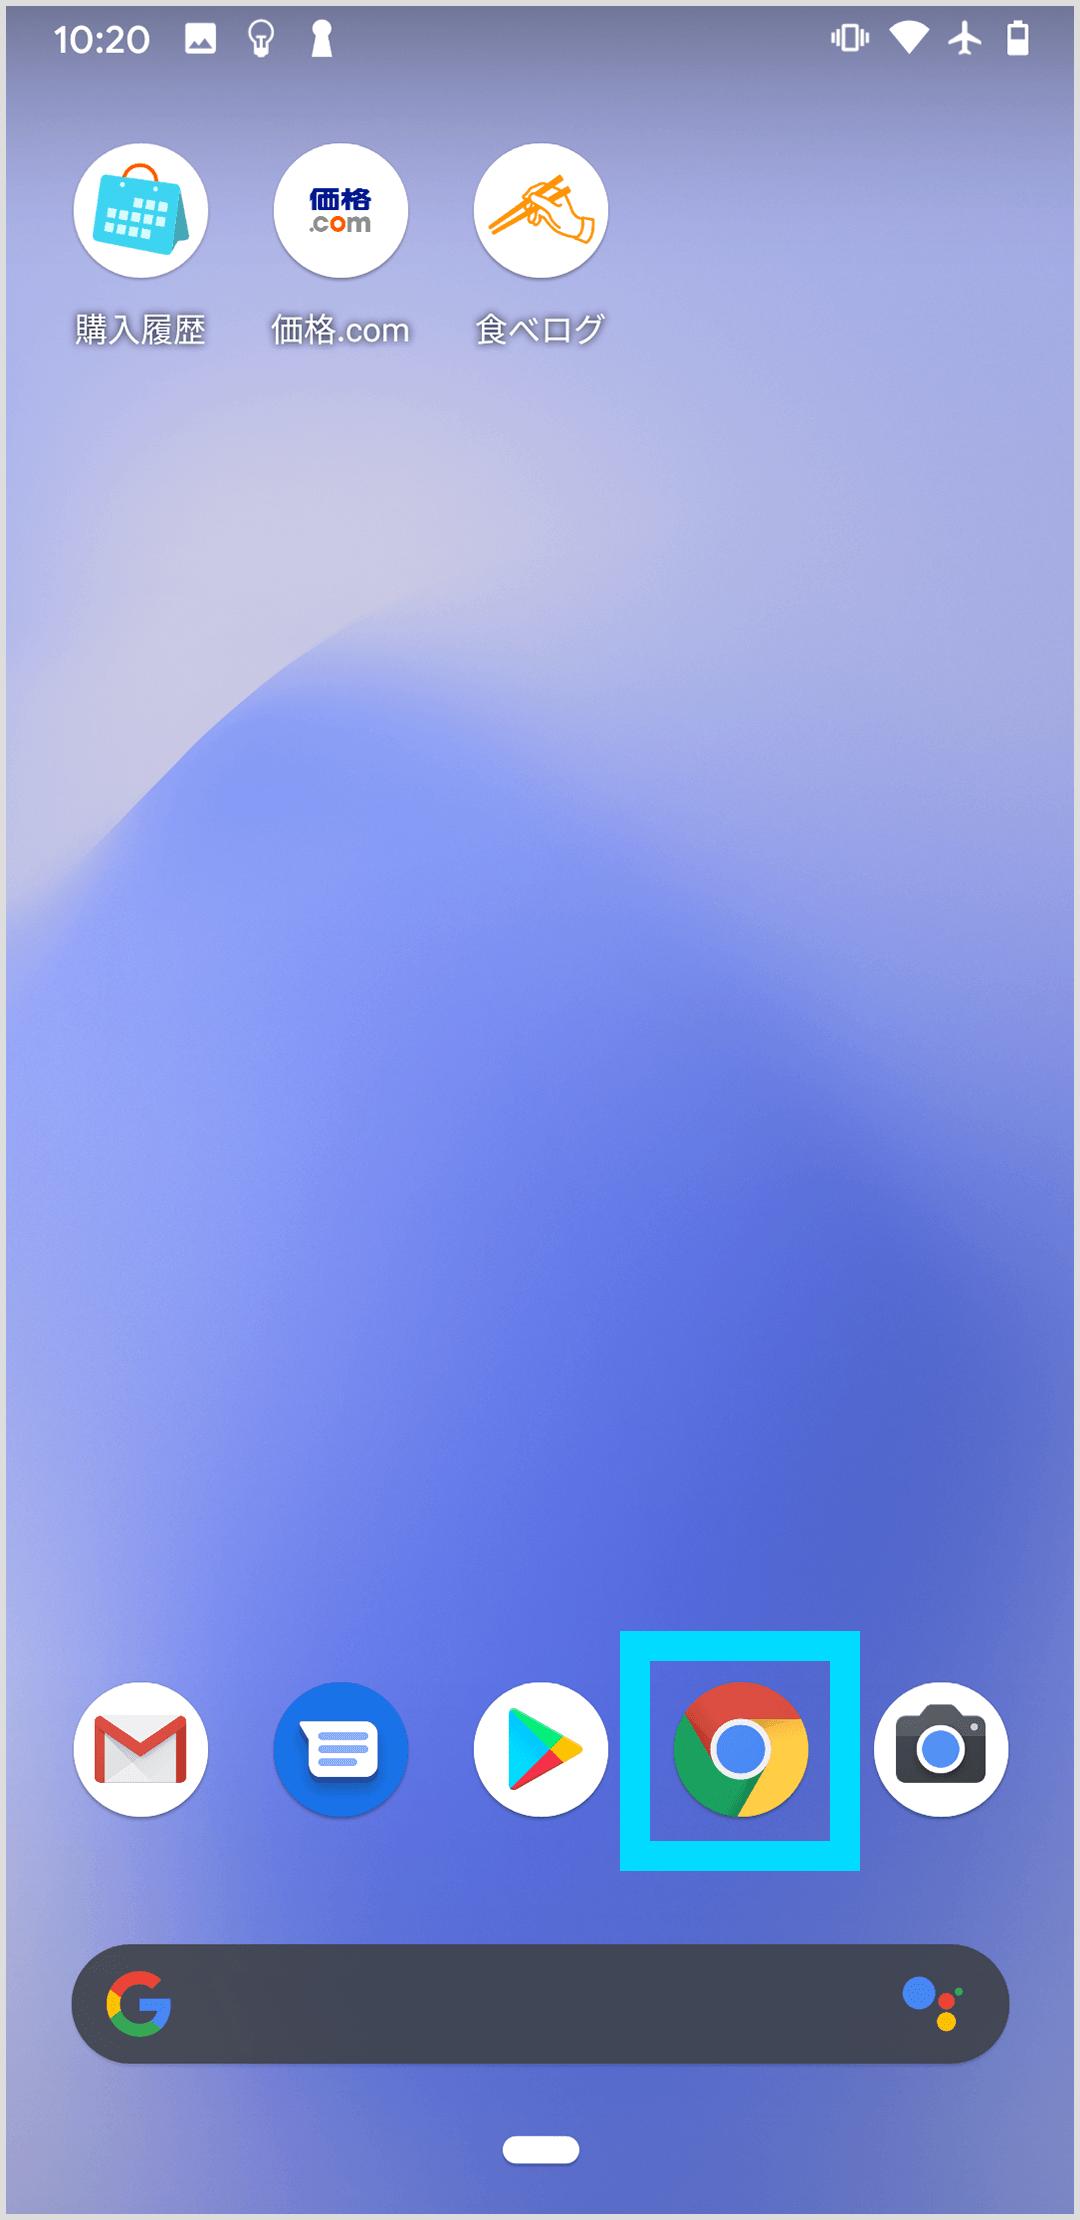 Android - 自動設定完了後のホーム画面